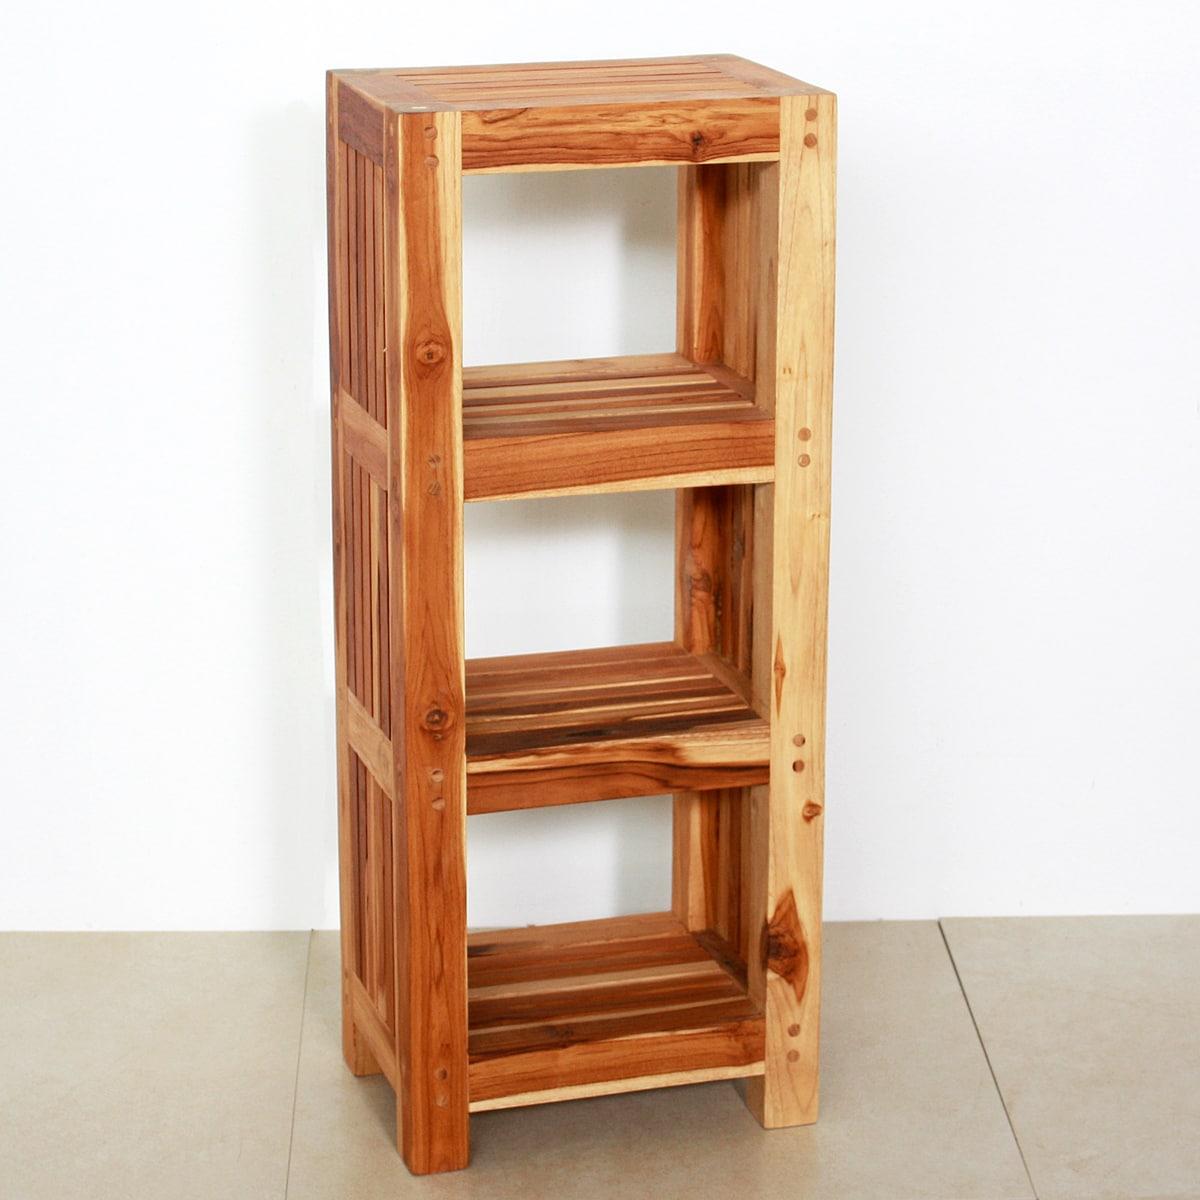 Wooden Shelves For Bathroom: Teak Wood Shelf Tower (Thailand)